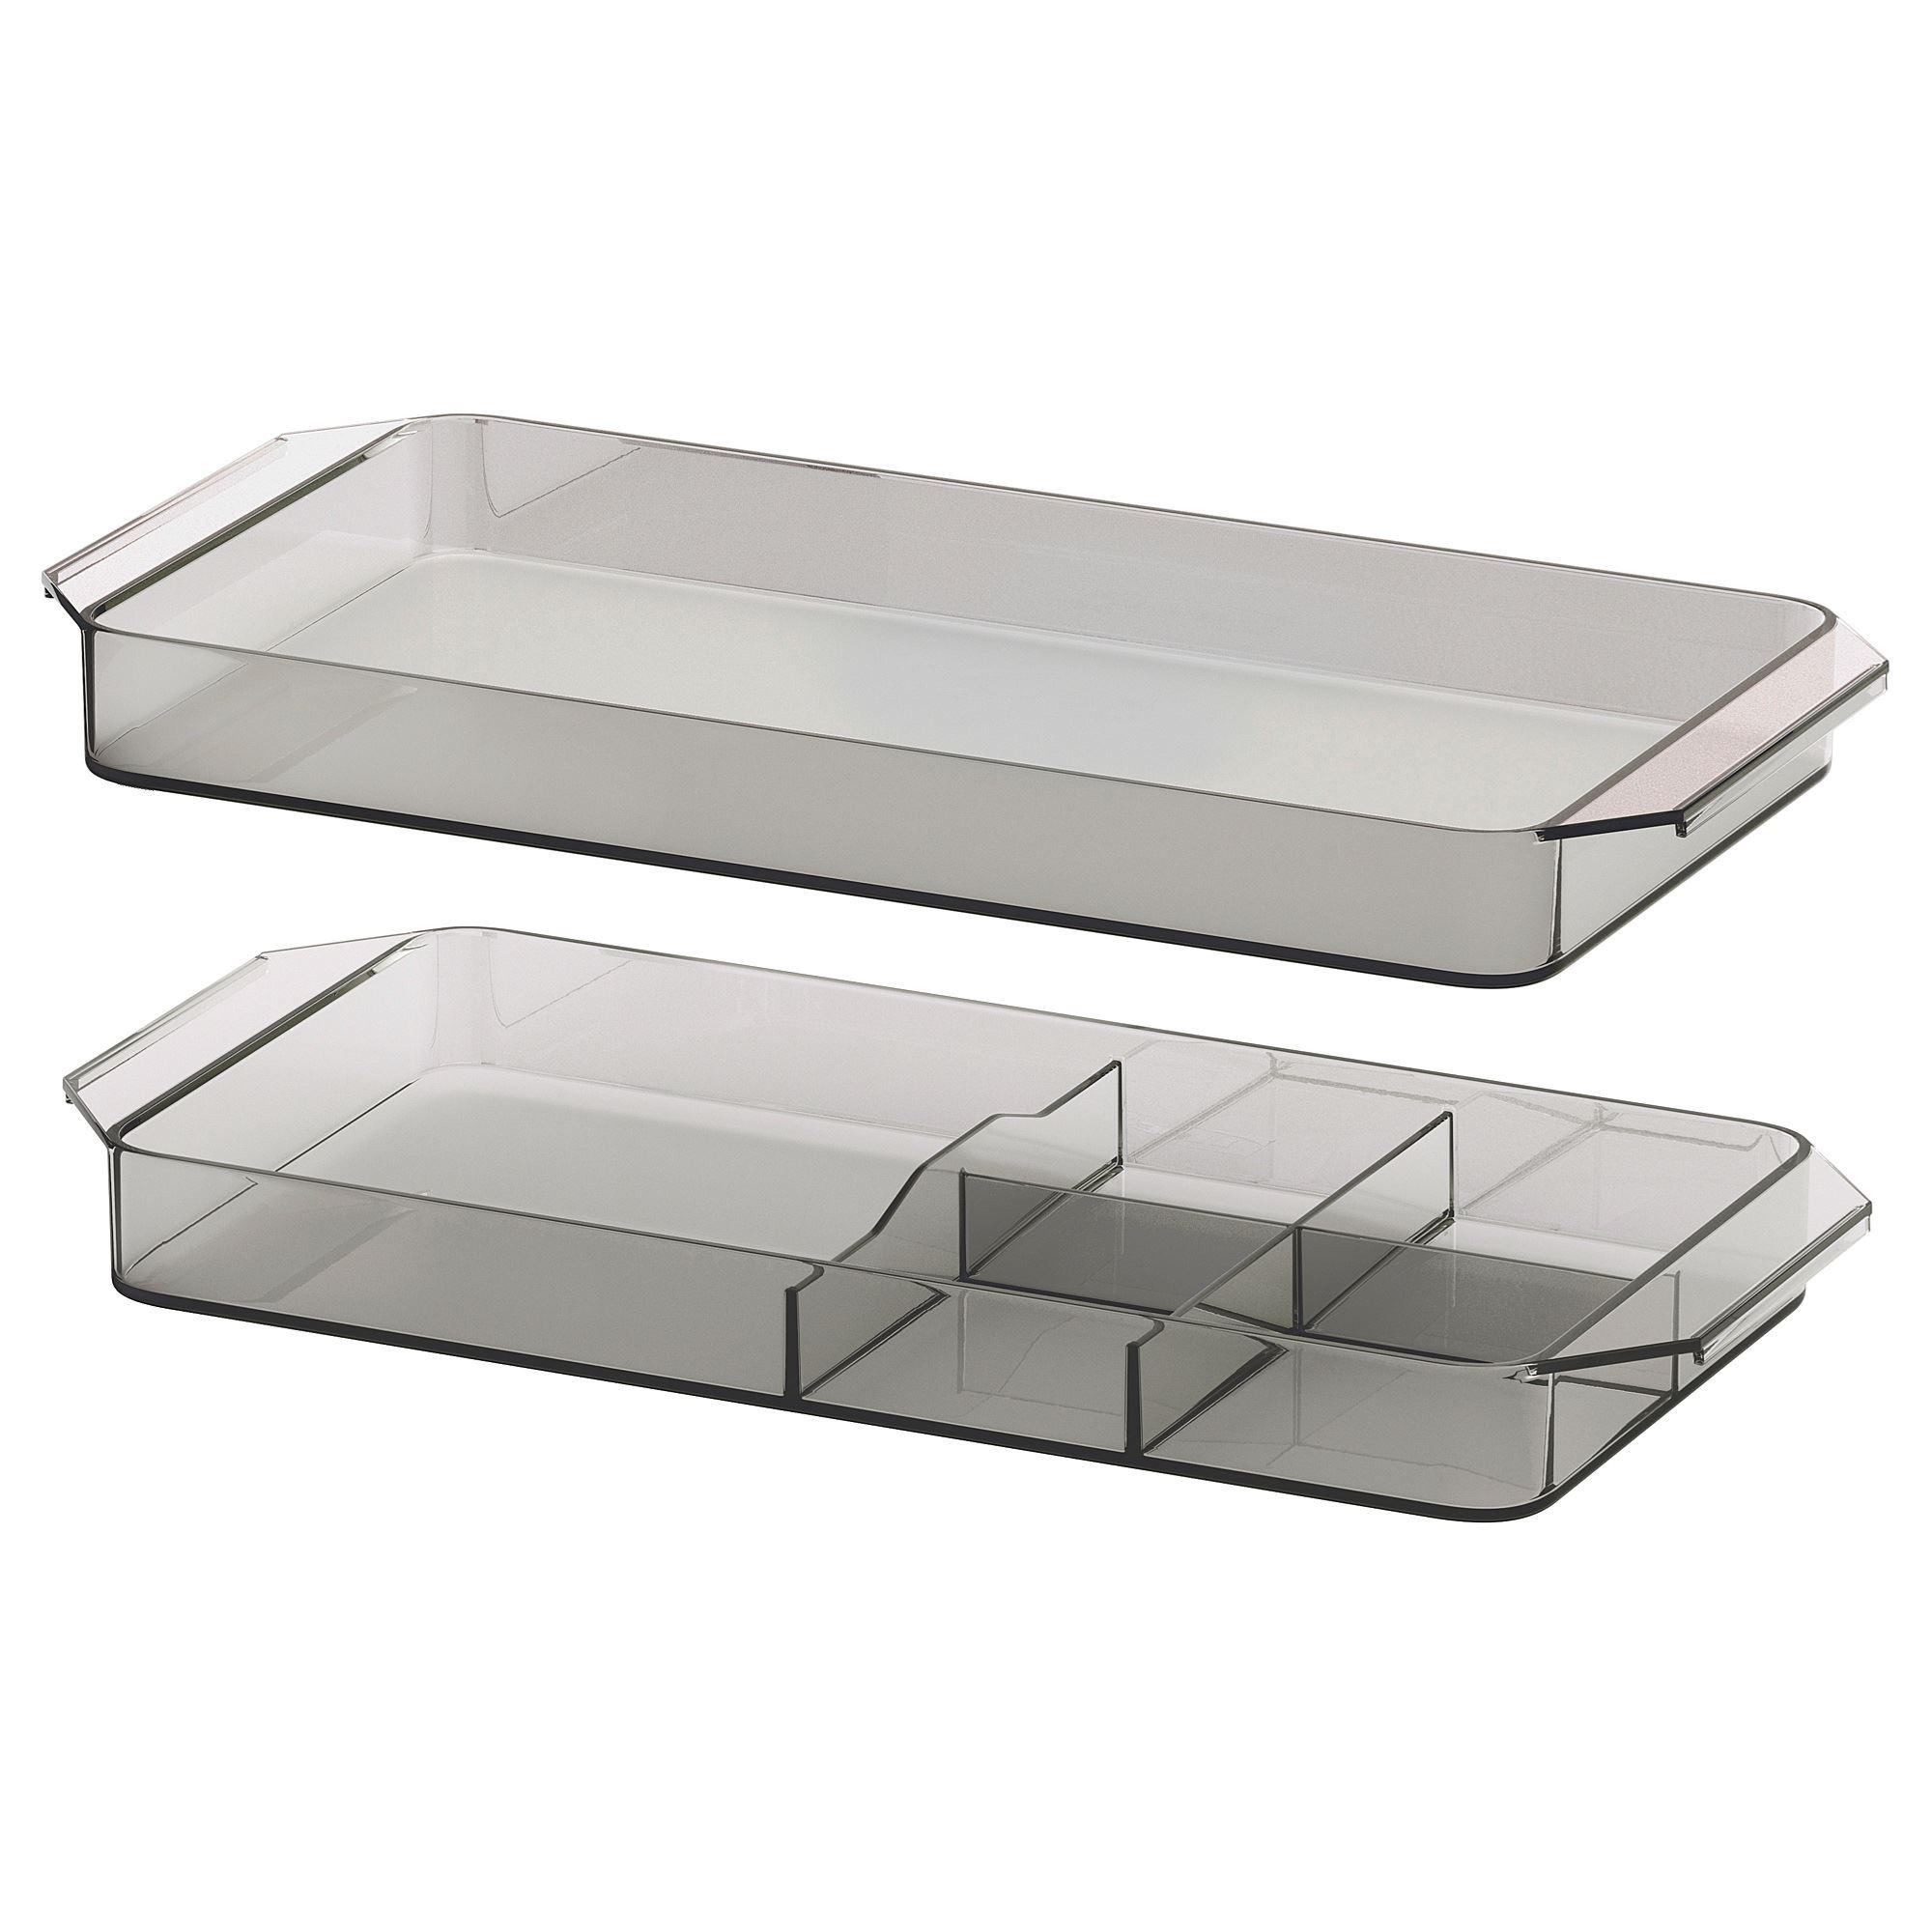 GODMORGON drawer organizer smoked  IKEA Bathroom